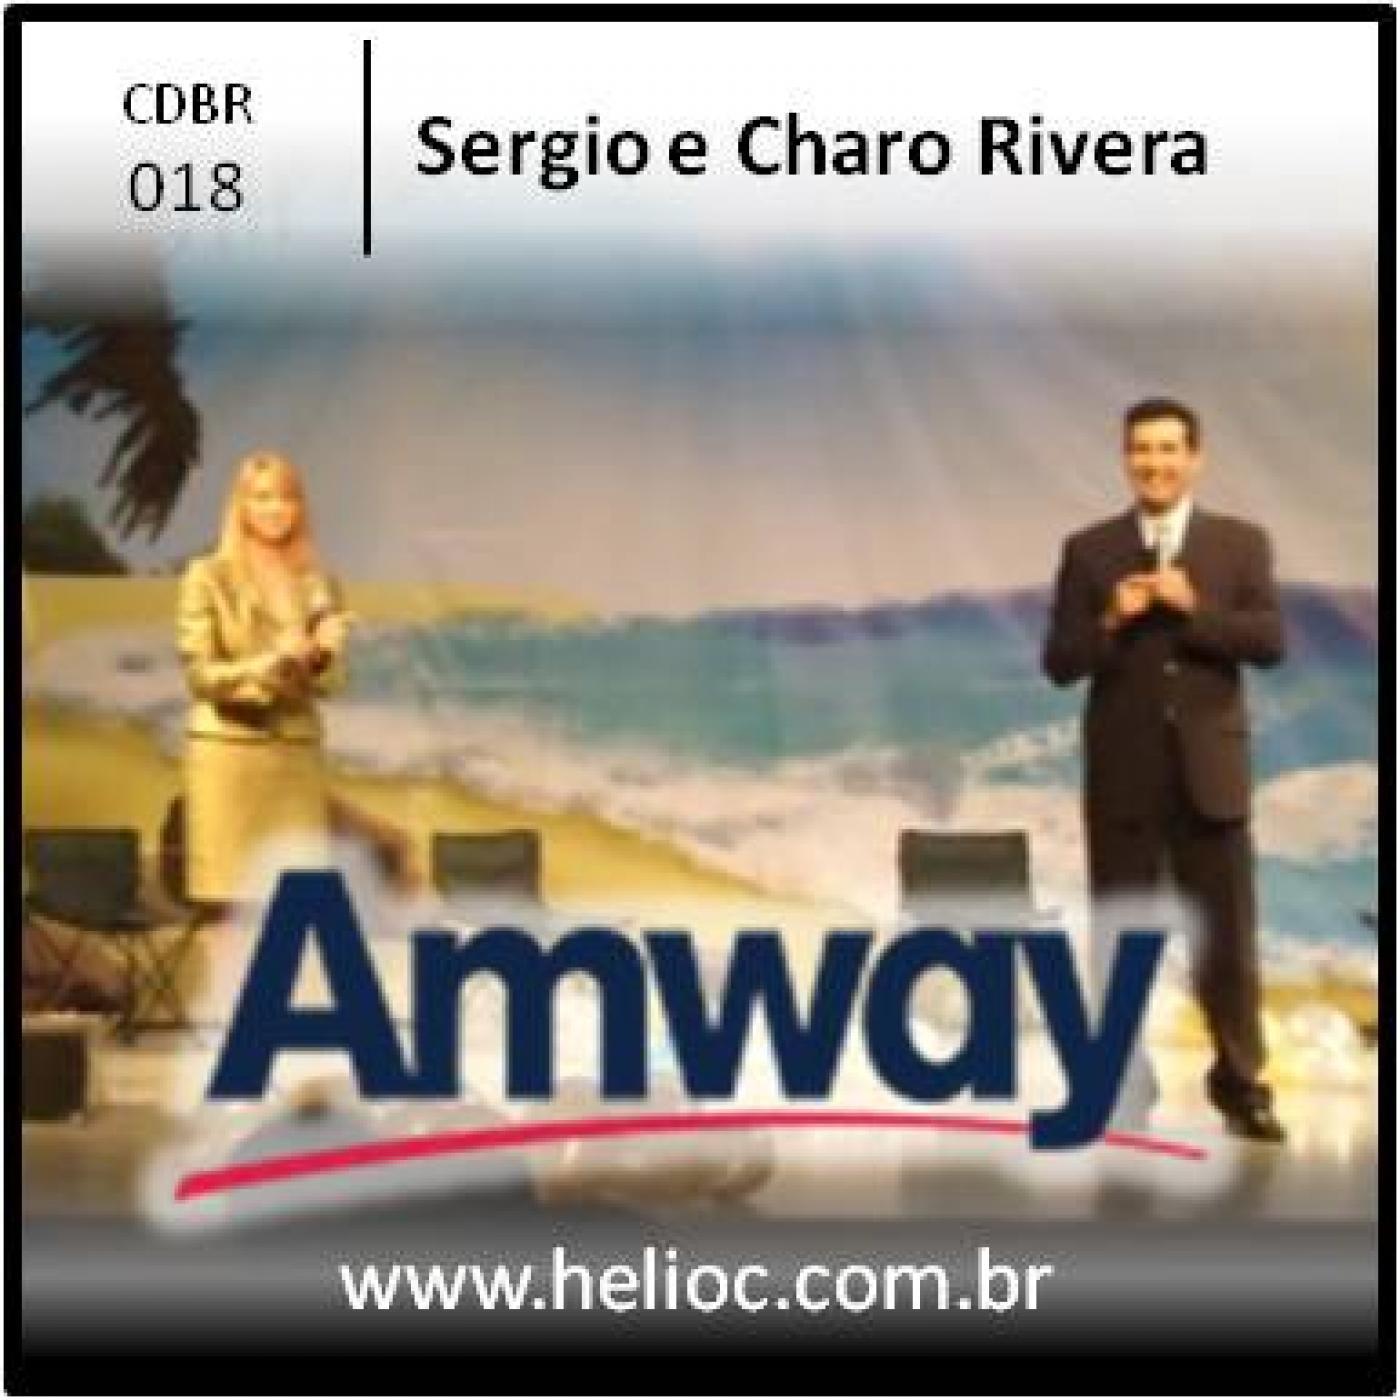 CDBR 018 - Treinar Todos os Dias - Sergio e Charo Rivera